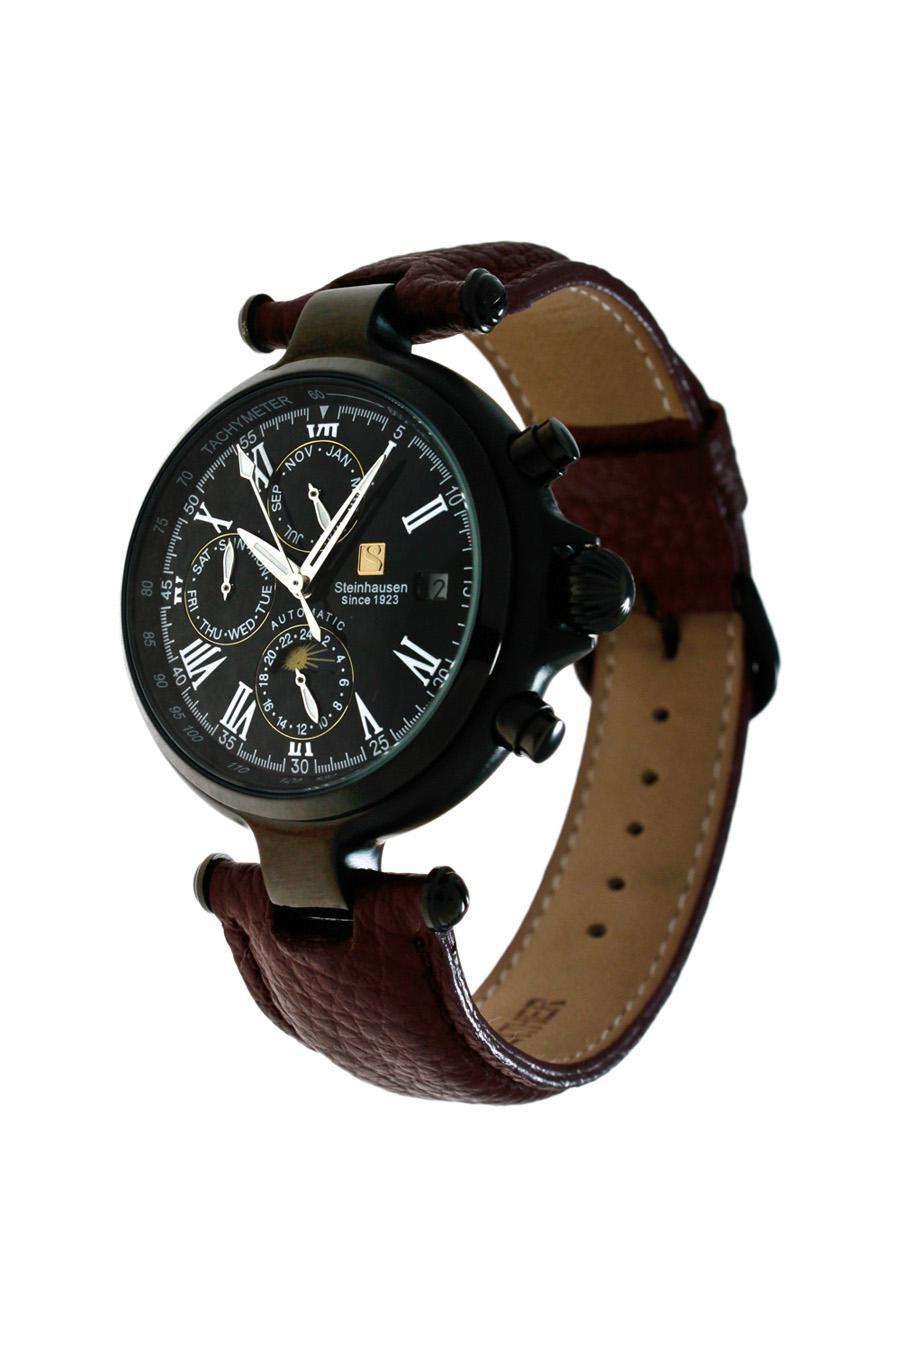 Steinhausen Classic Automatic Calendar Watch With Am/Pm Indicator #Watch